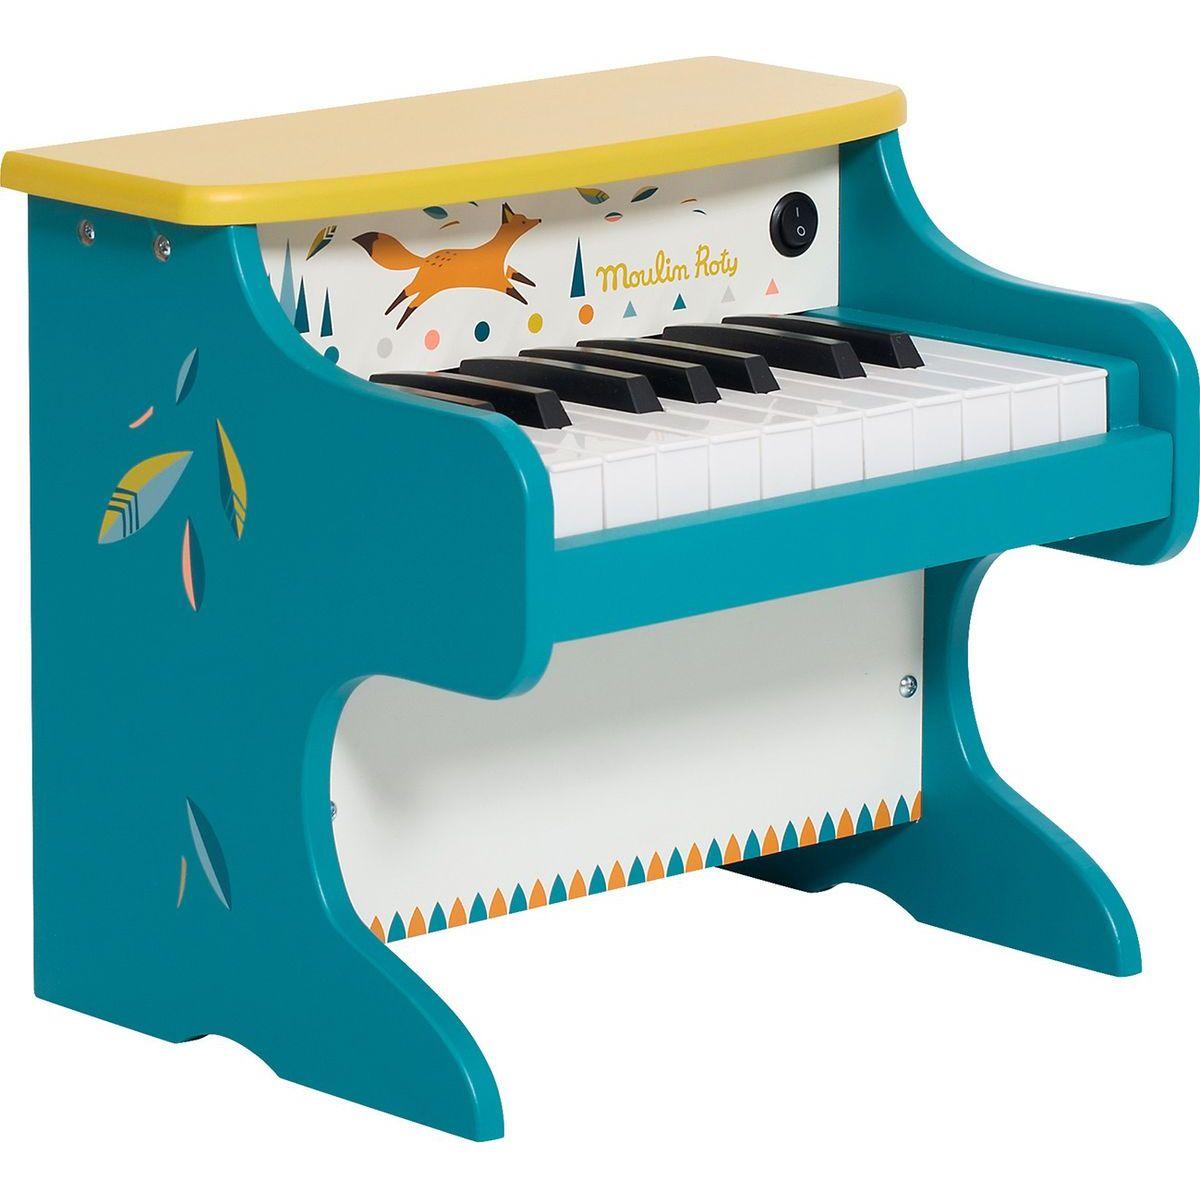 Moulin Roty Drevené piano Moulin Roty